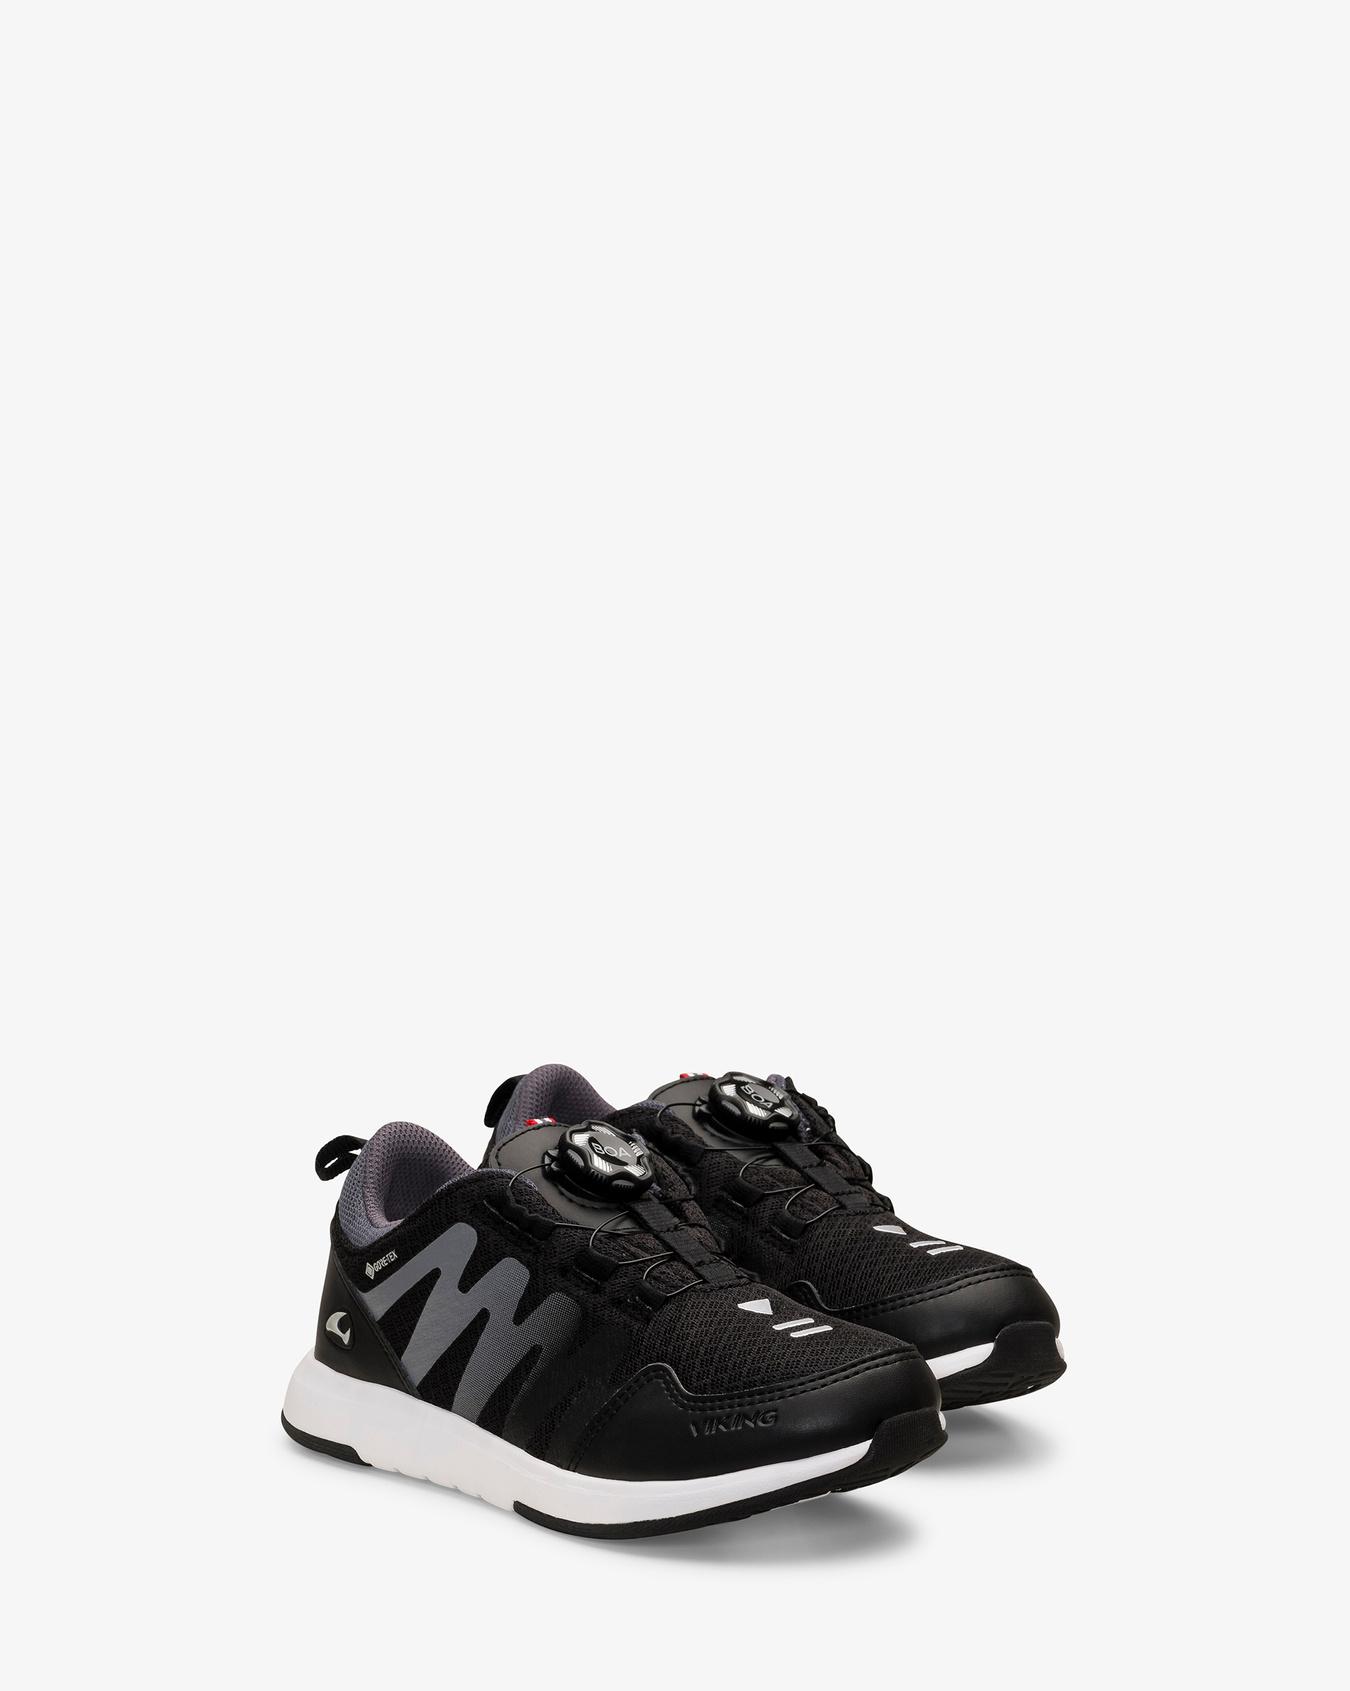 Bislett 2.0 Boa GTX Sneaker